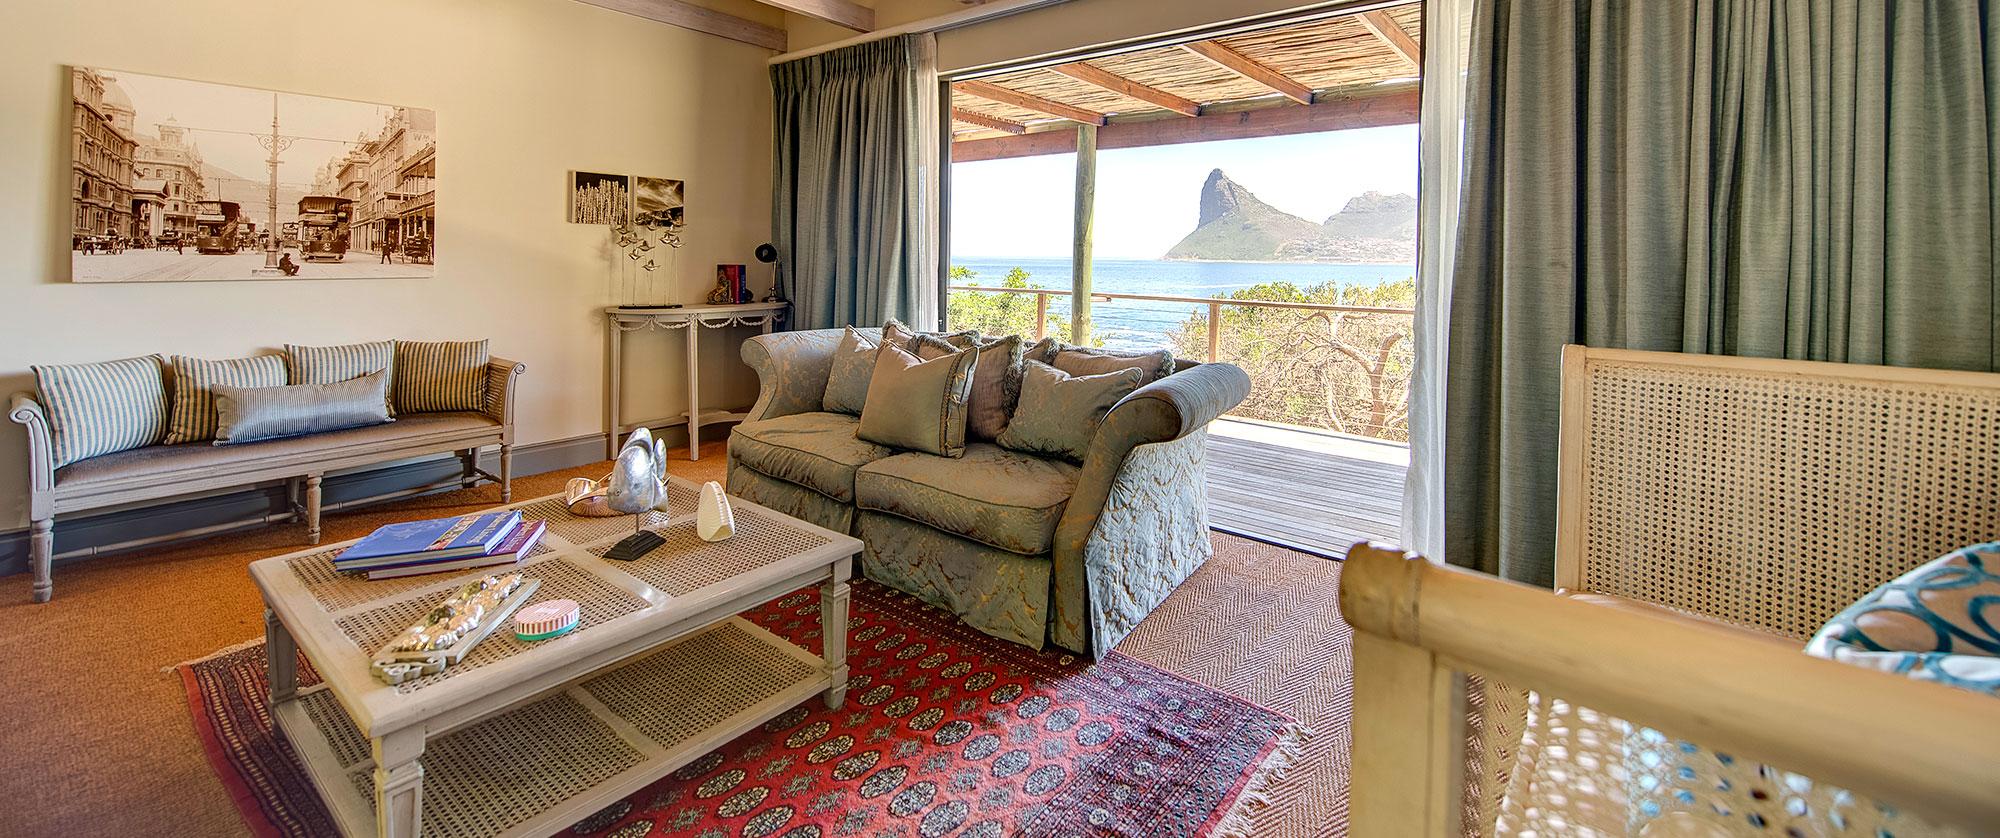 South Africa Family Safari Package - Tintswalo Atlantic